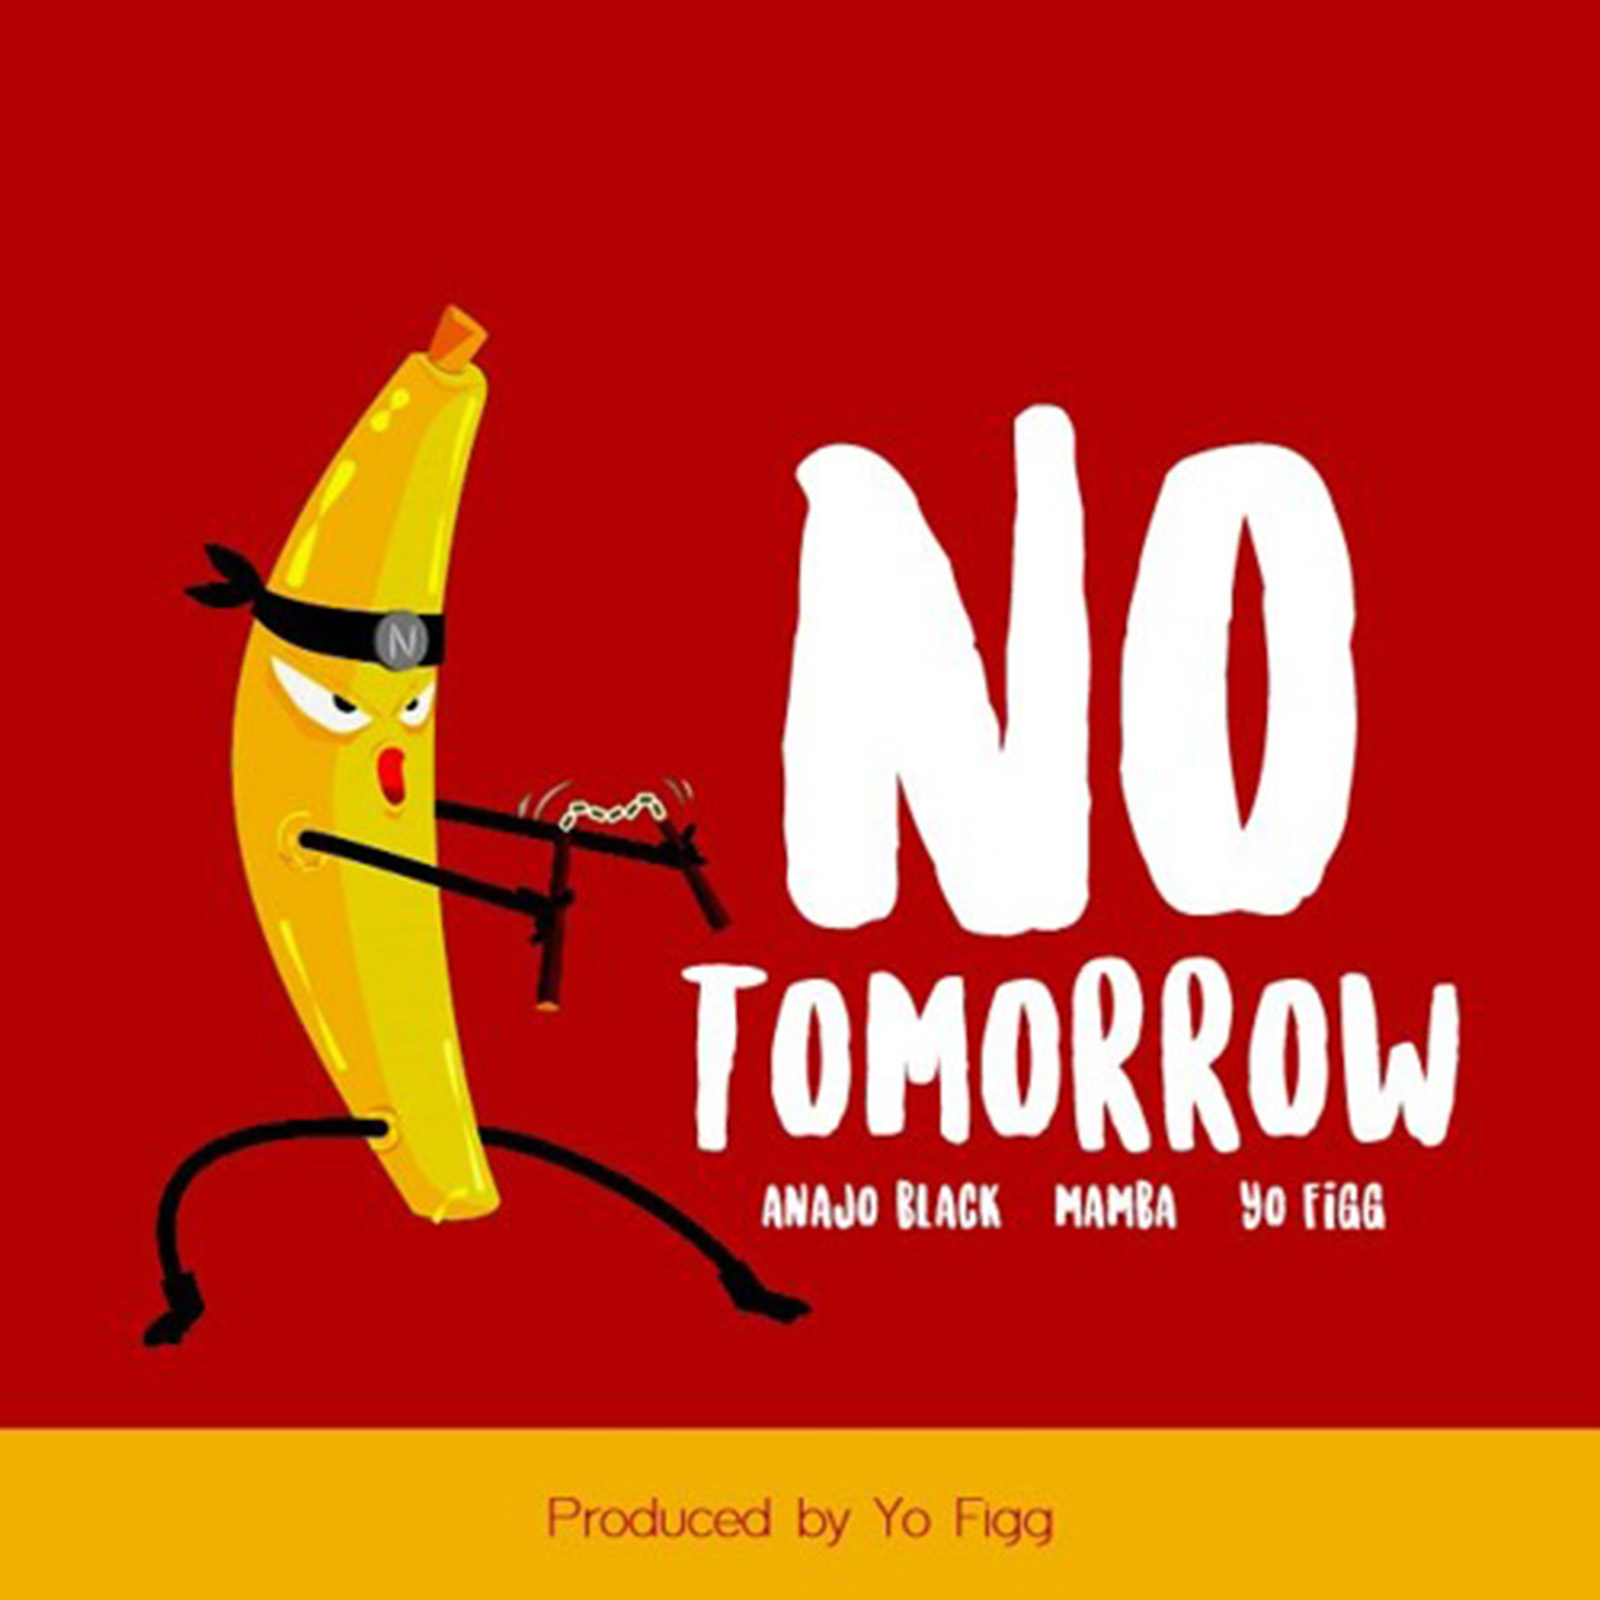 No Tomorrow by Anajo Black feat. Mamba & Yo Figg